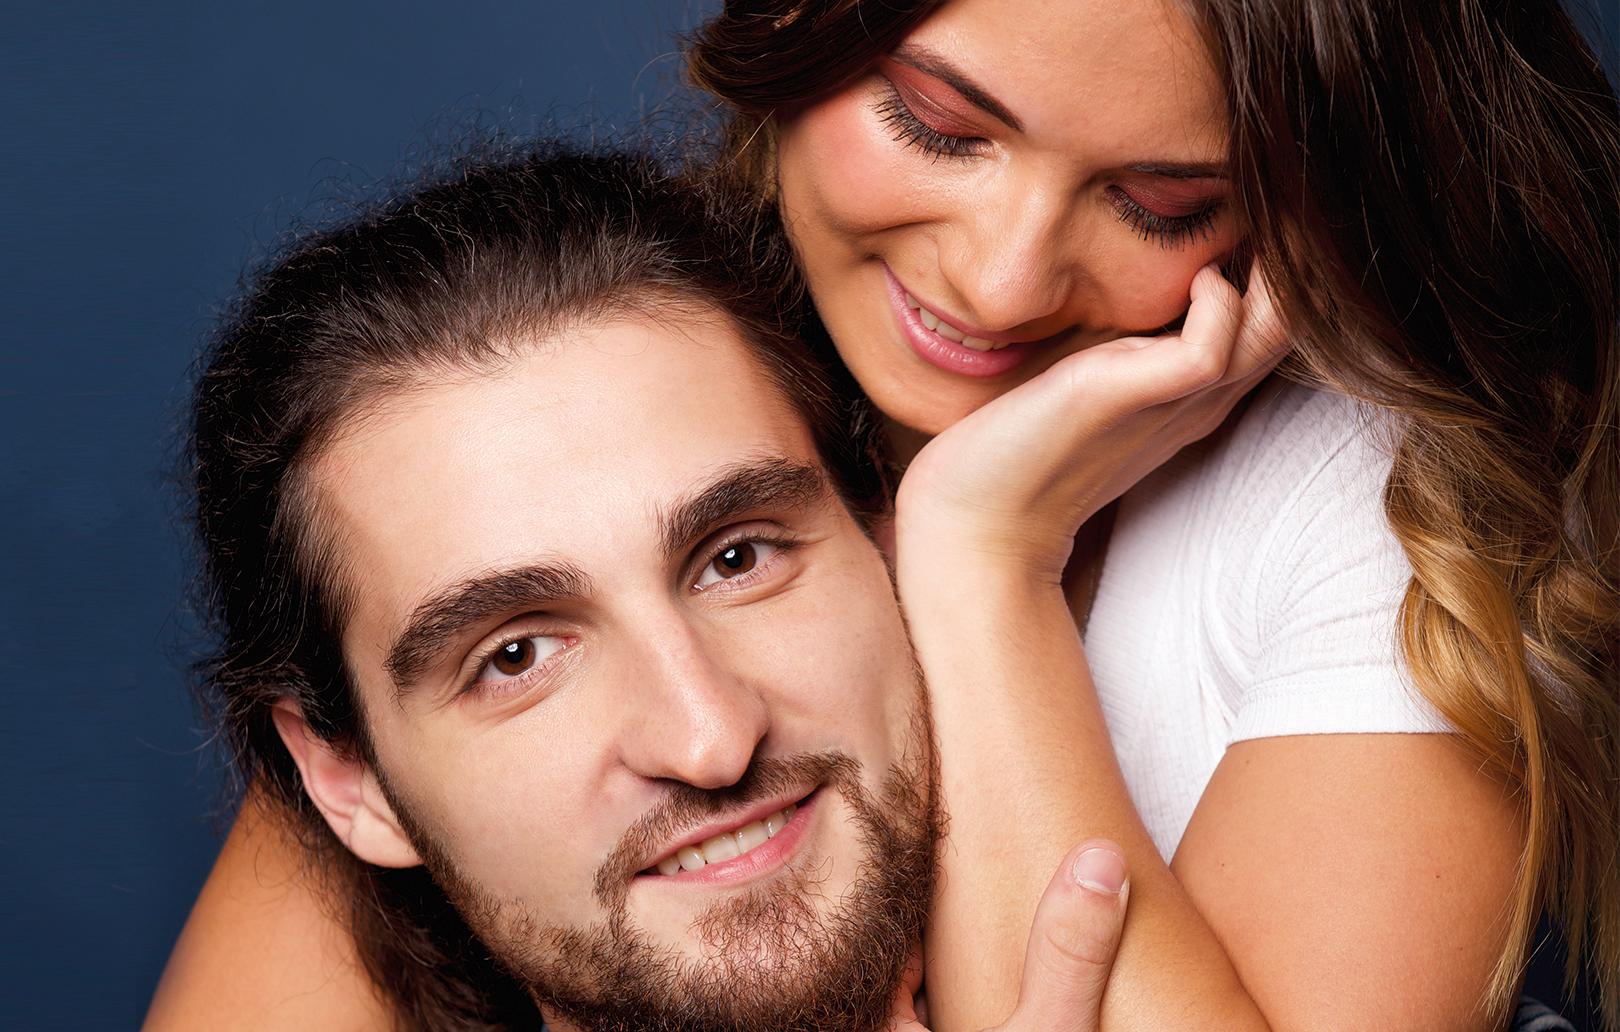 partner-fotoshooting-koblenz-bg31618473395